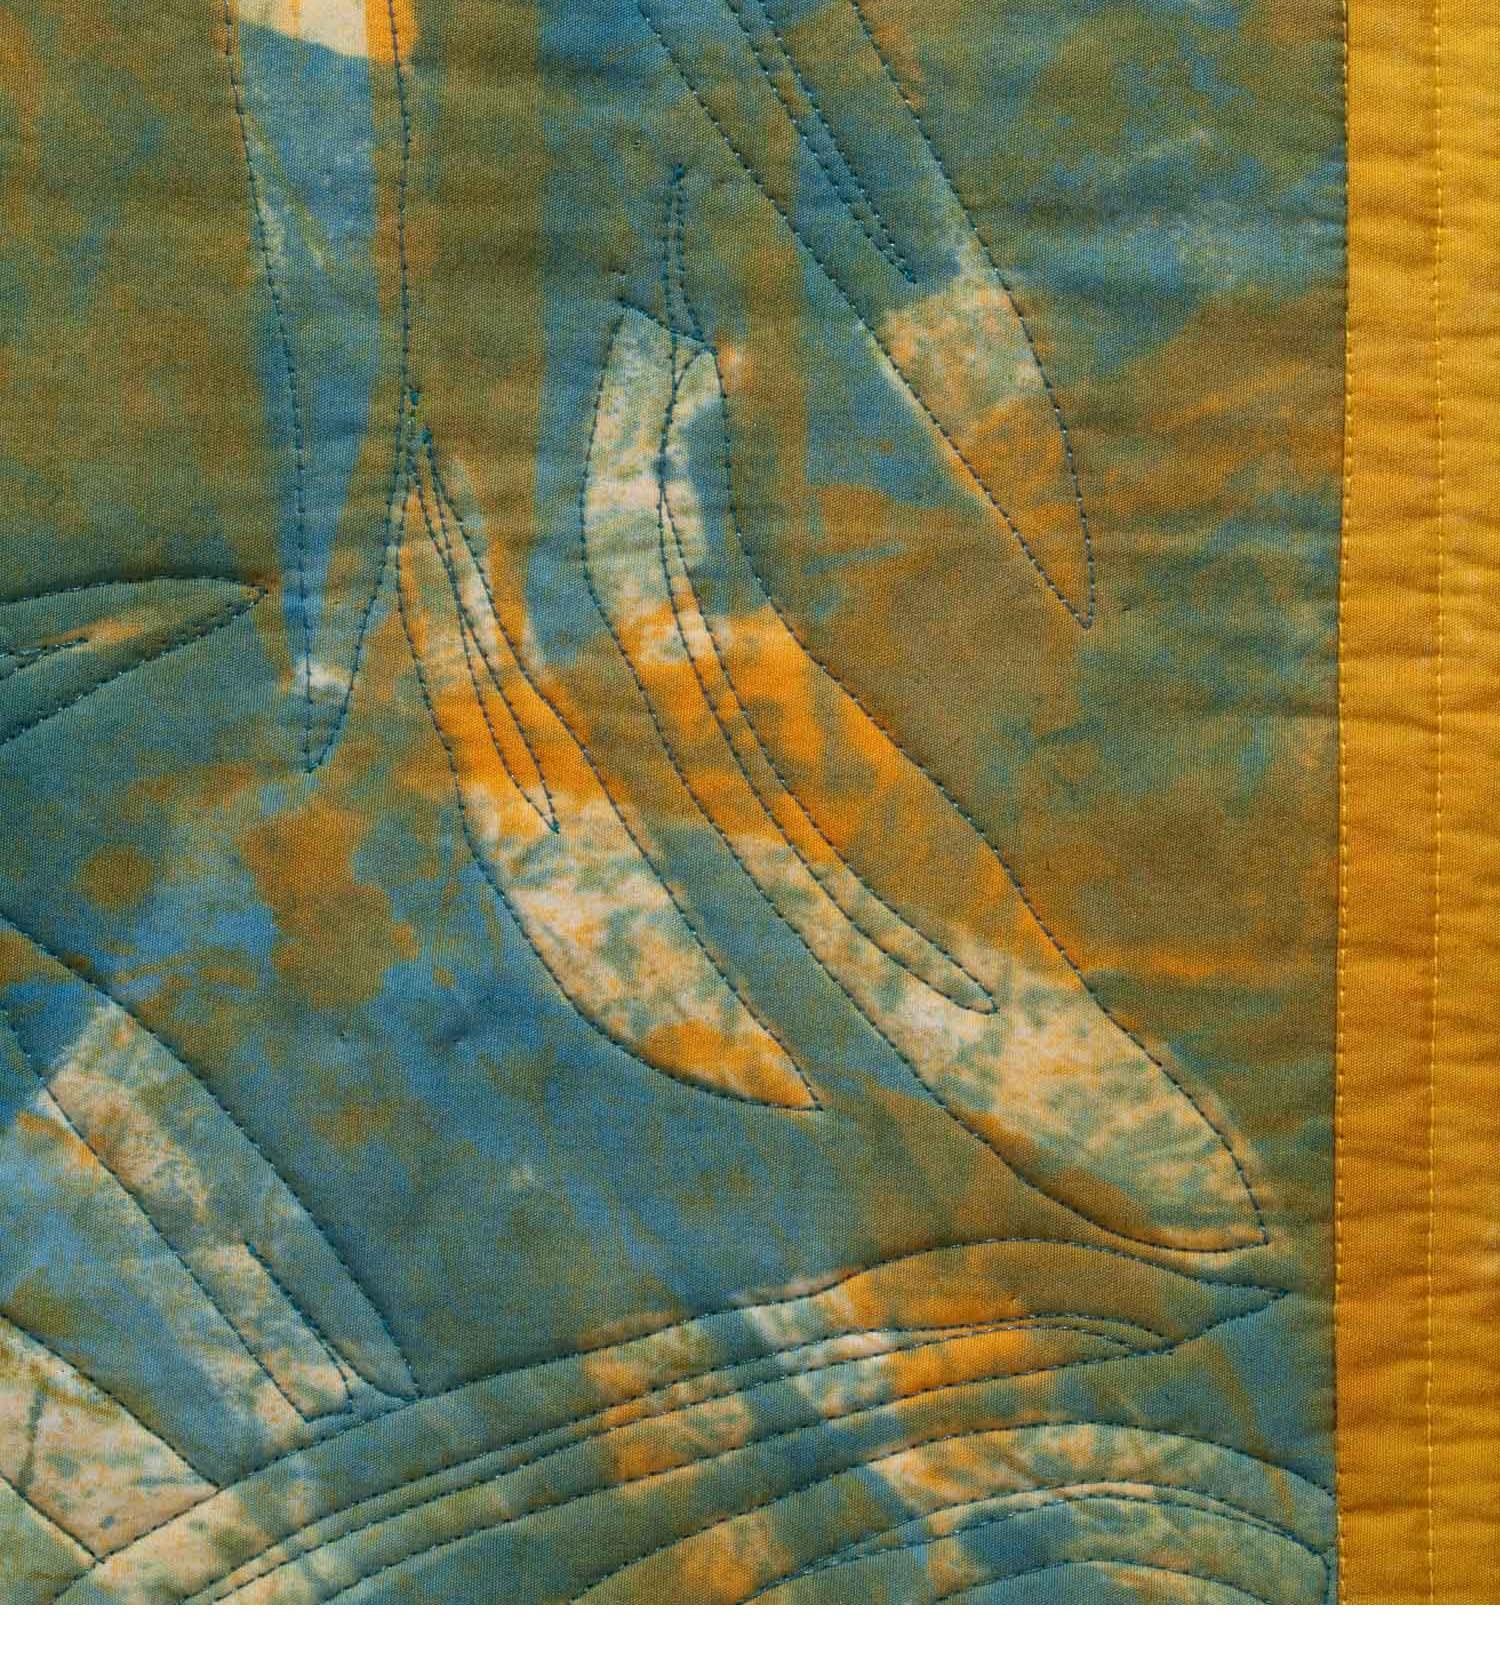 Eucalyptus Shadows, detail